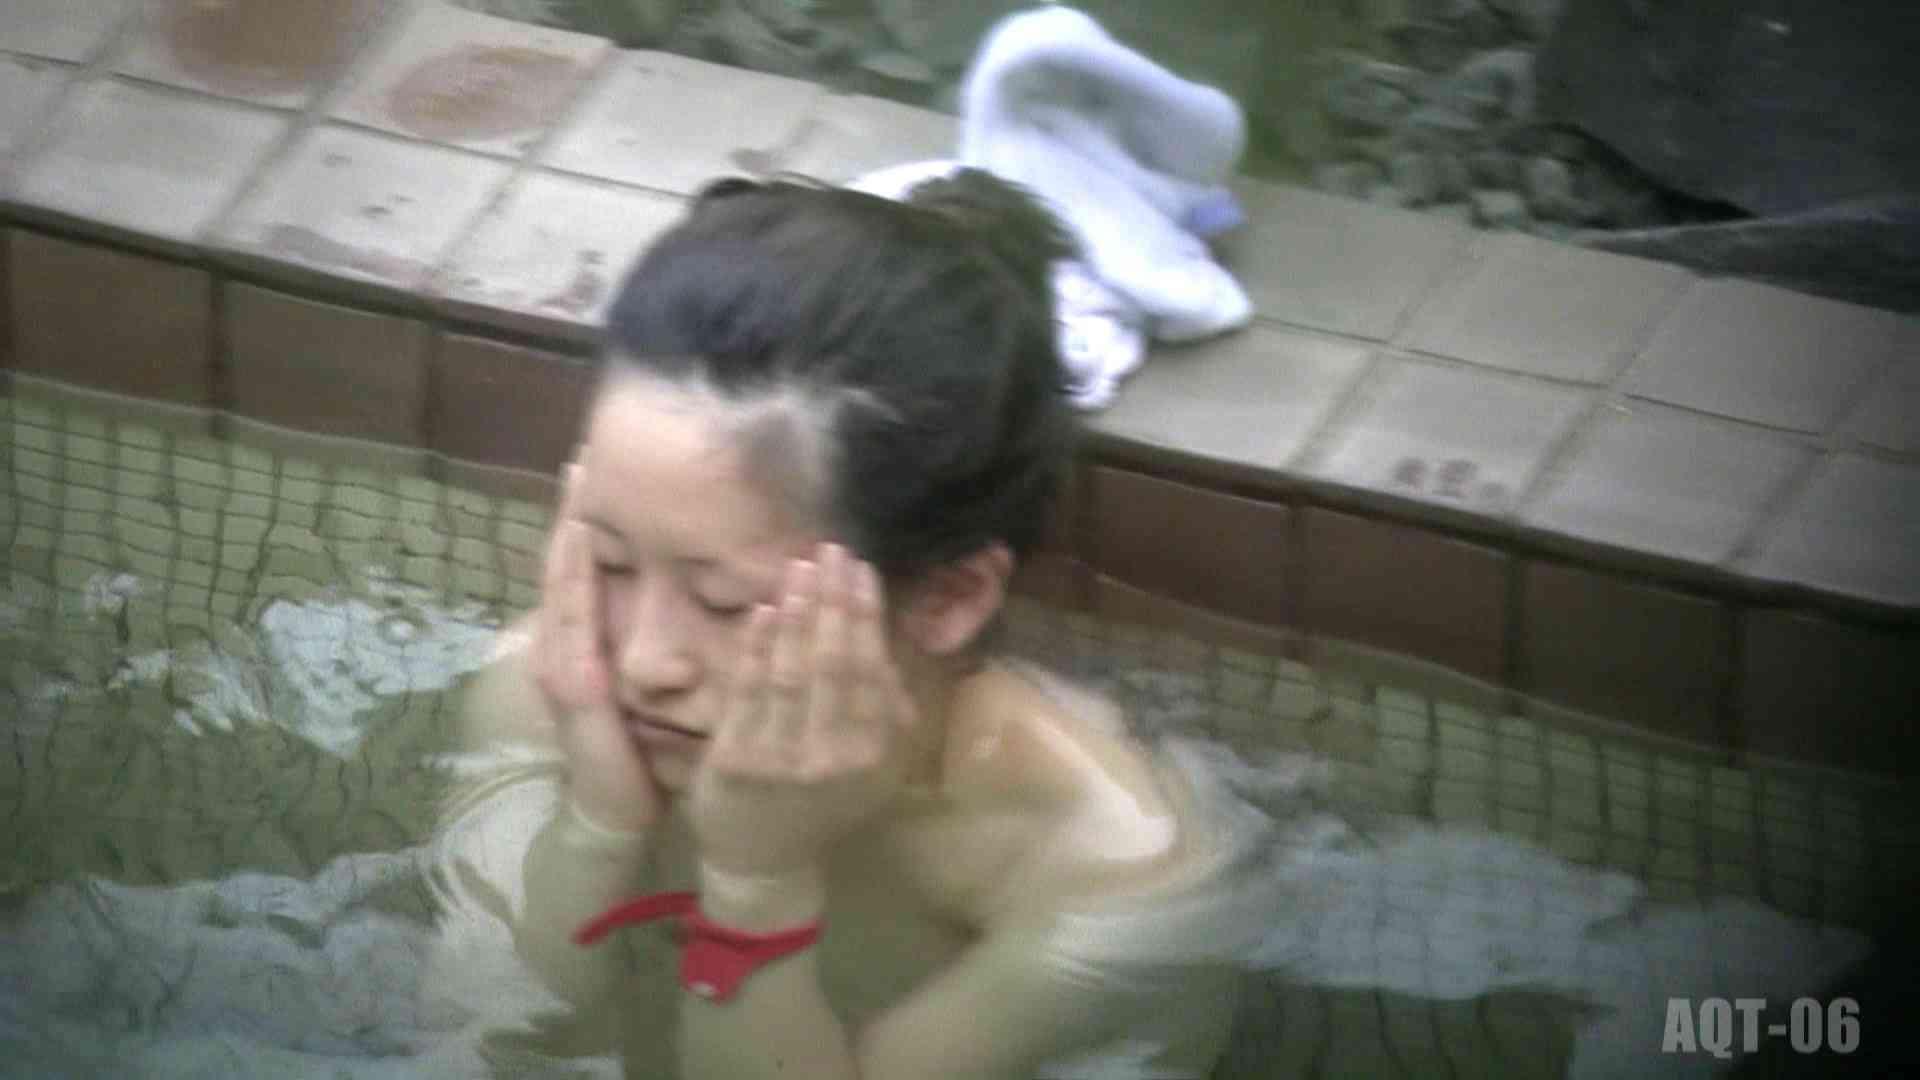 Aquaな露天風呂Vol.758 OL女体 すけべAV動画紹介 90連発 62